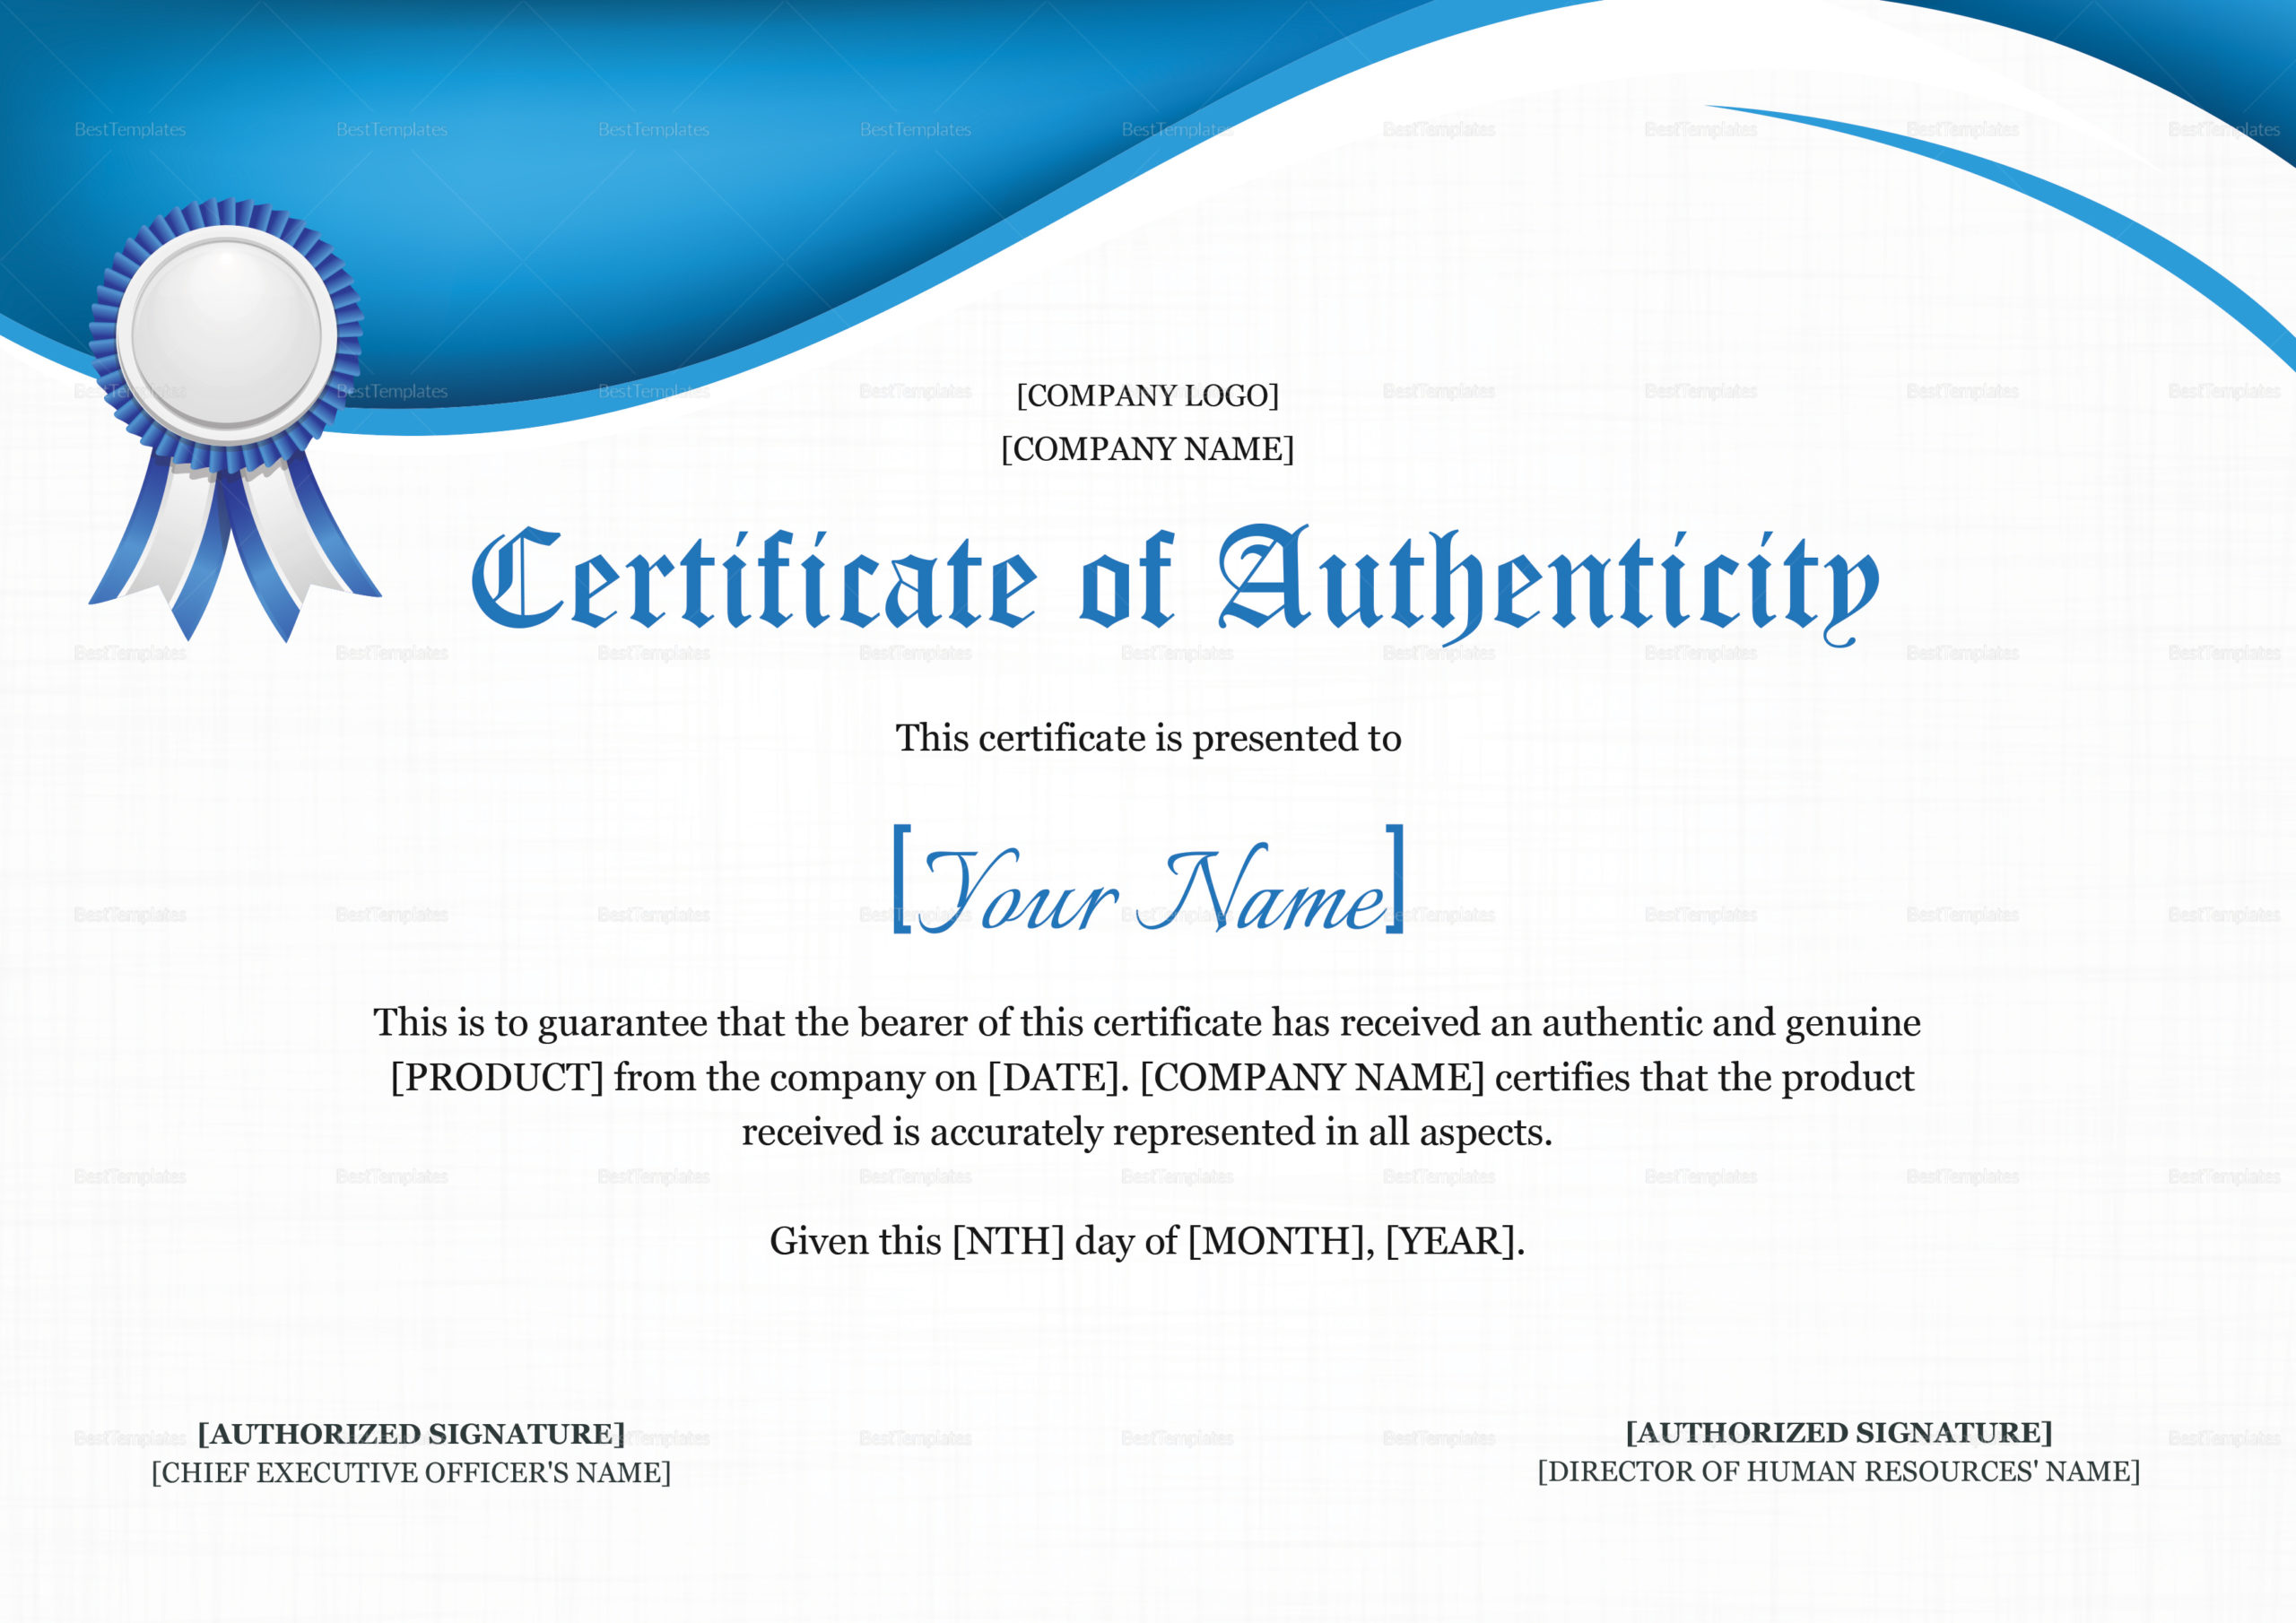 Product Authenticity Certificate Design Template In Psd Word for Certificate Of Authenticity Template